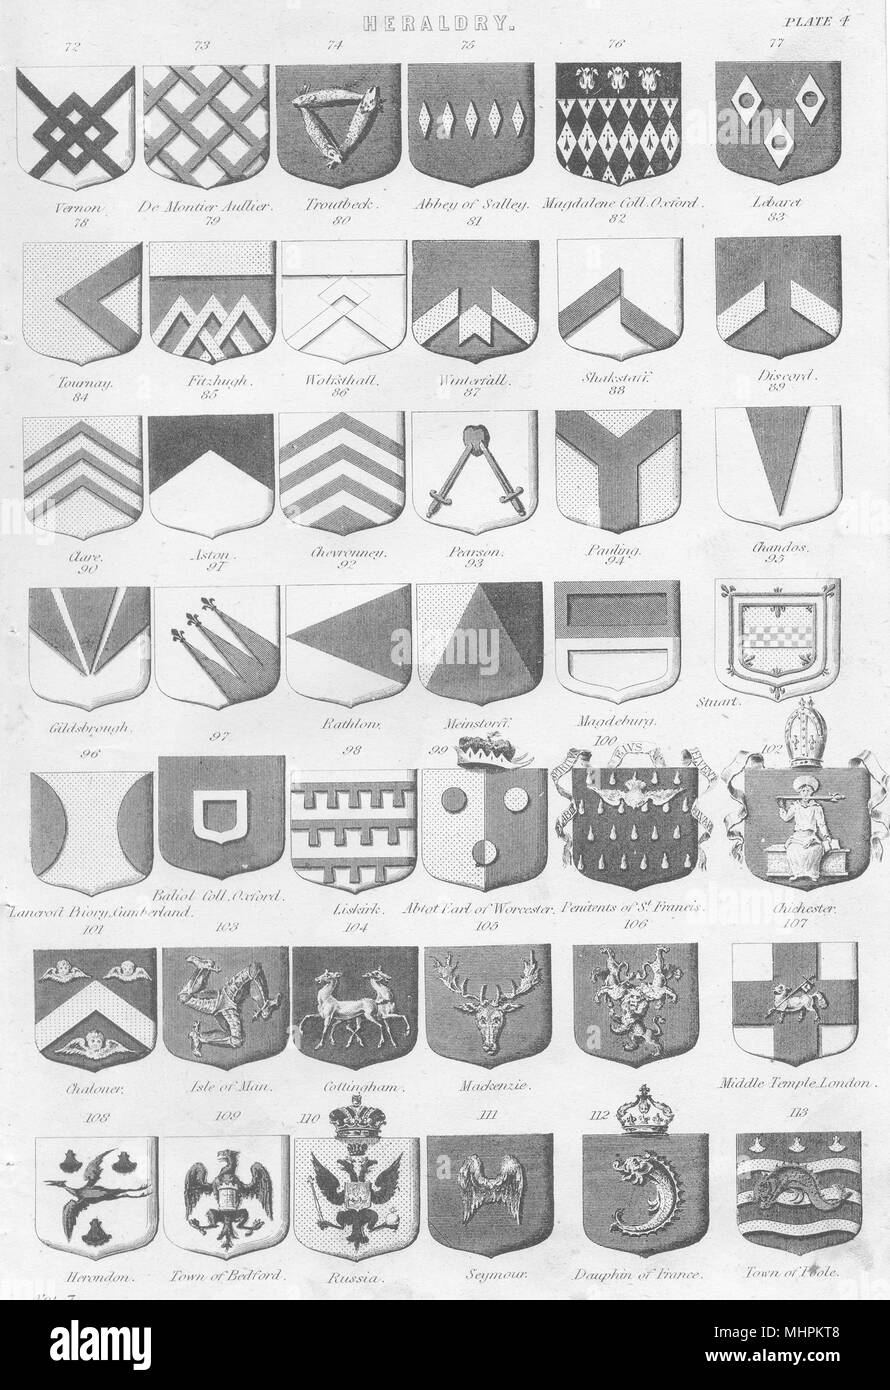 PEERS. Heraldry (3)  1880 old antique vintage print picture - Stock Image